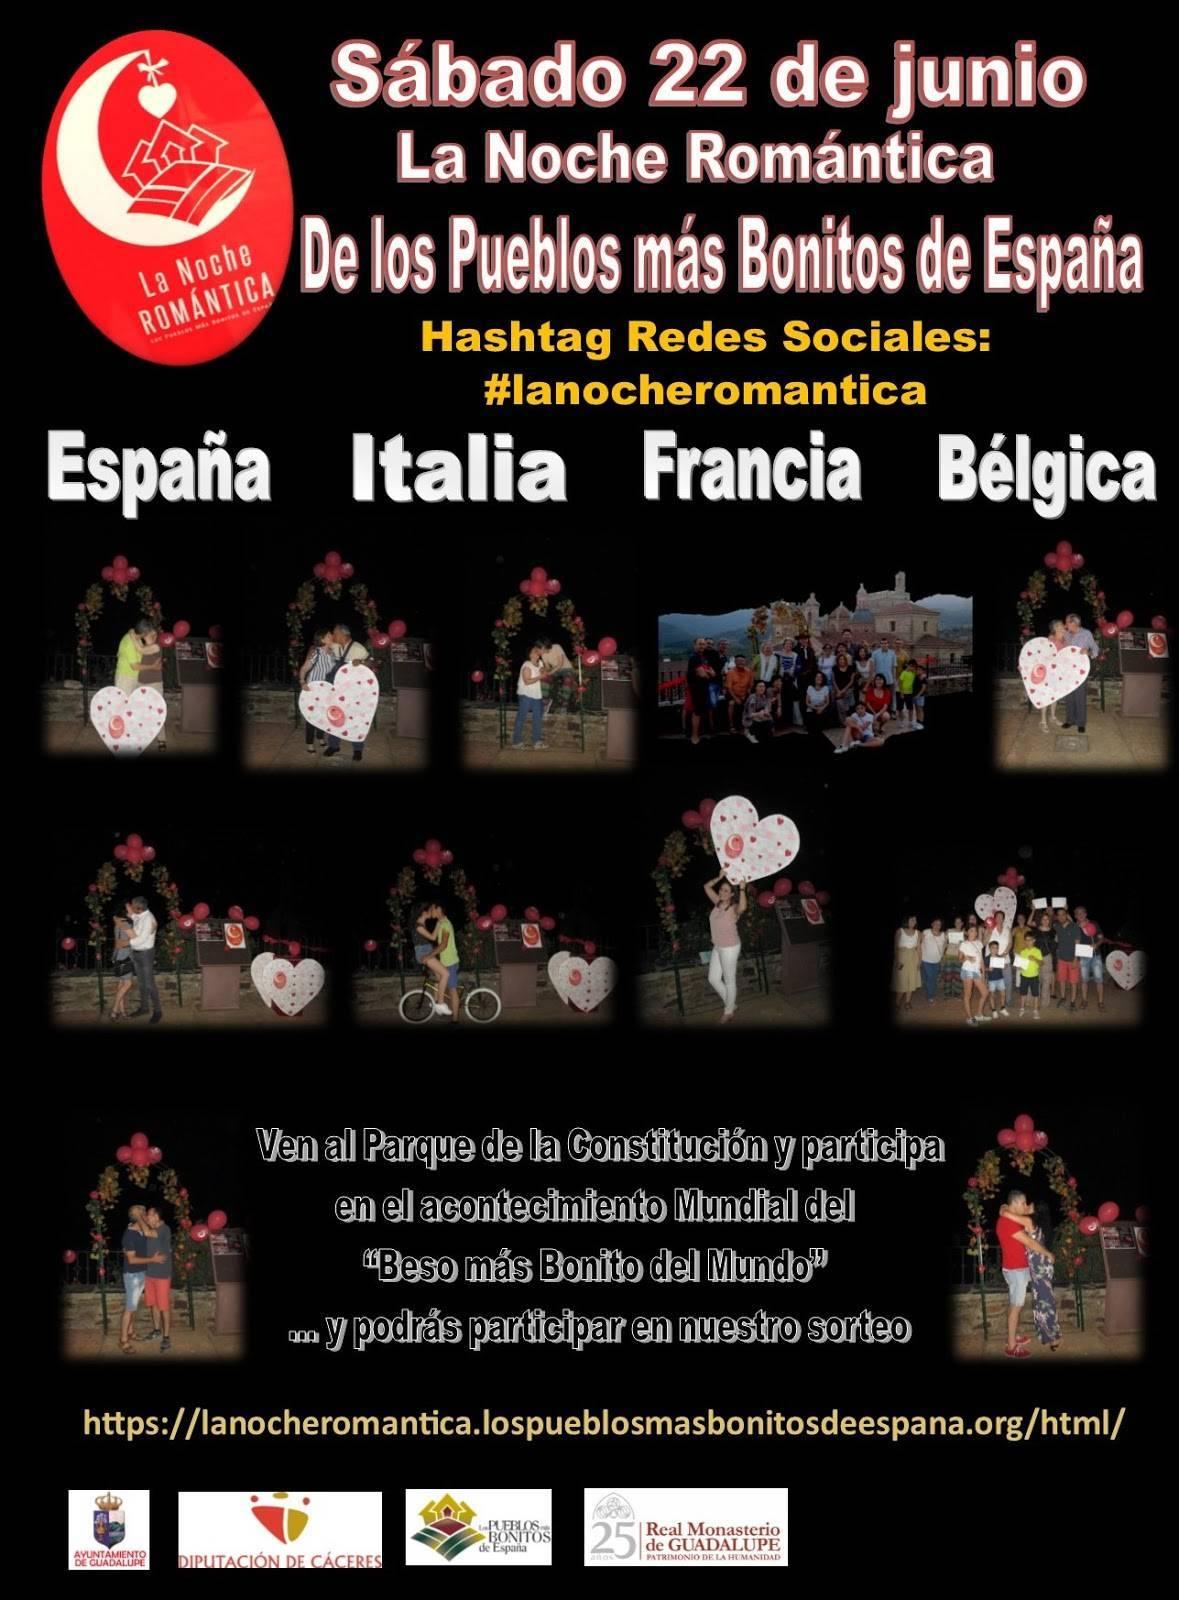 La noche romántica 2019 - Guadalupe (Cáceres) 1